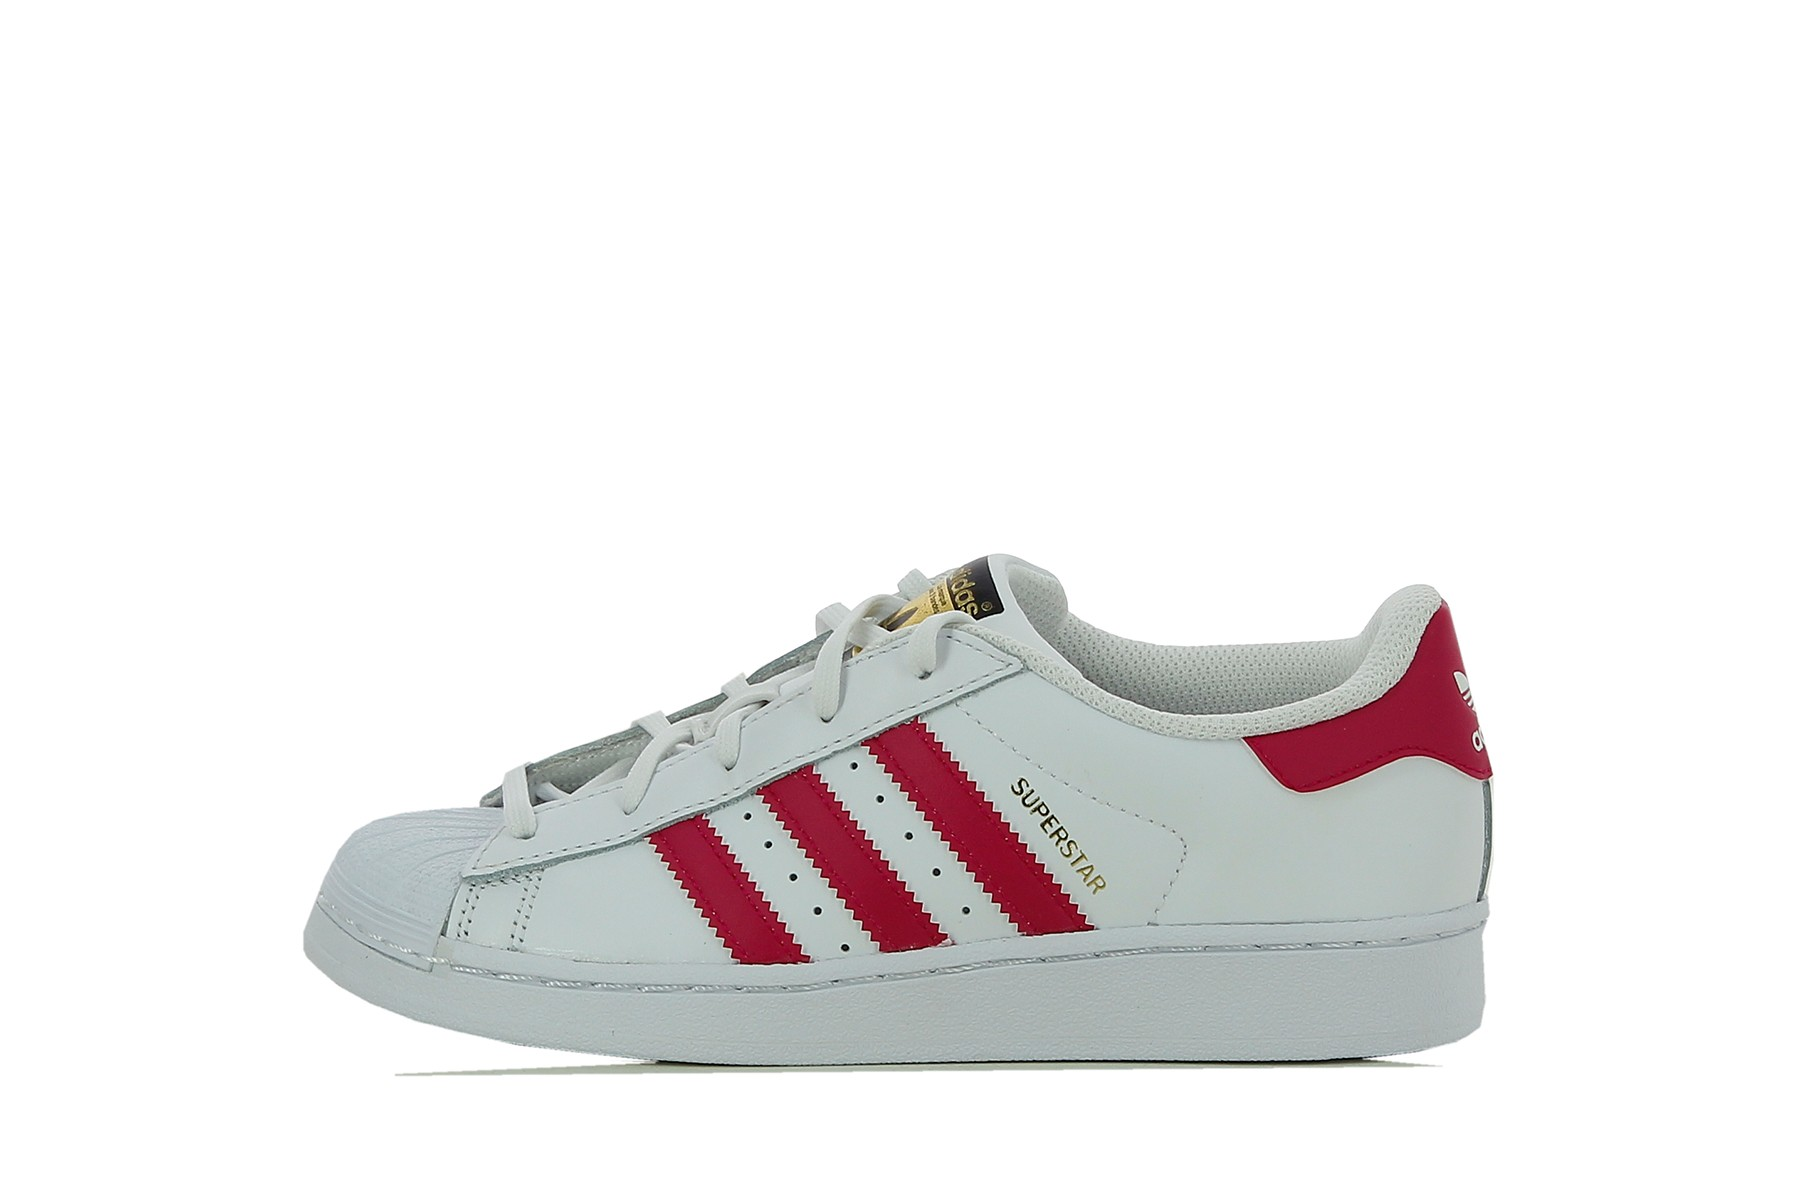 Baskets Cadet Ref Superstar Ba8382 Adidas Originals TtqxrwTR